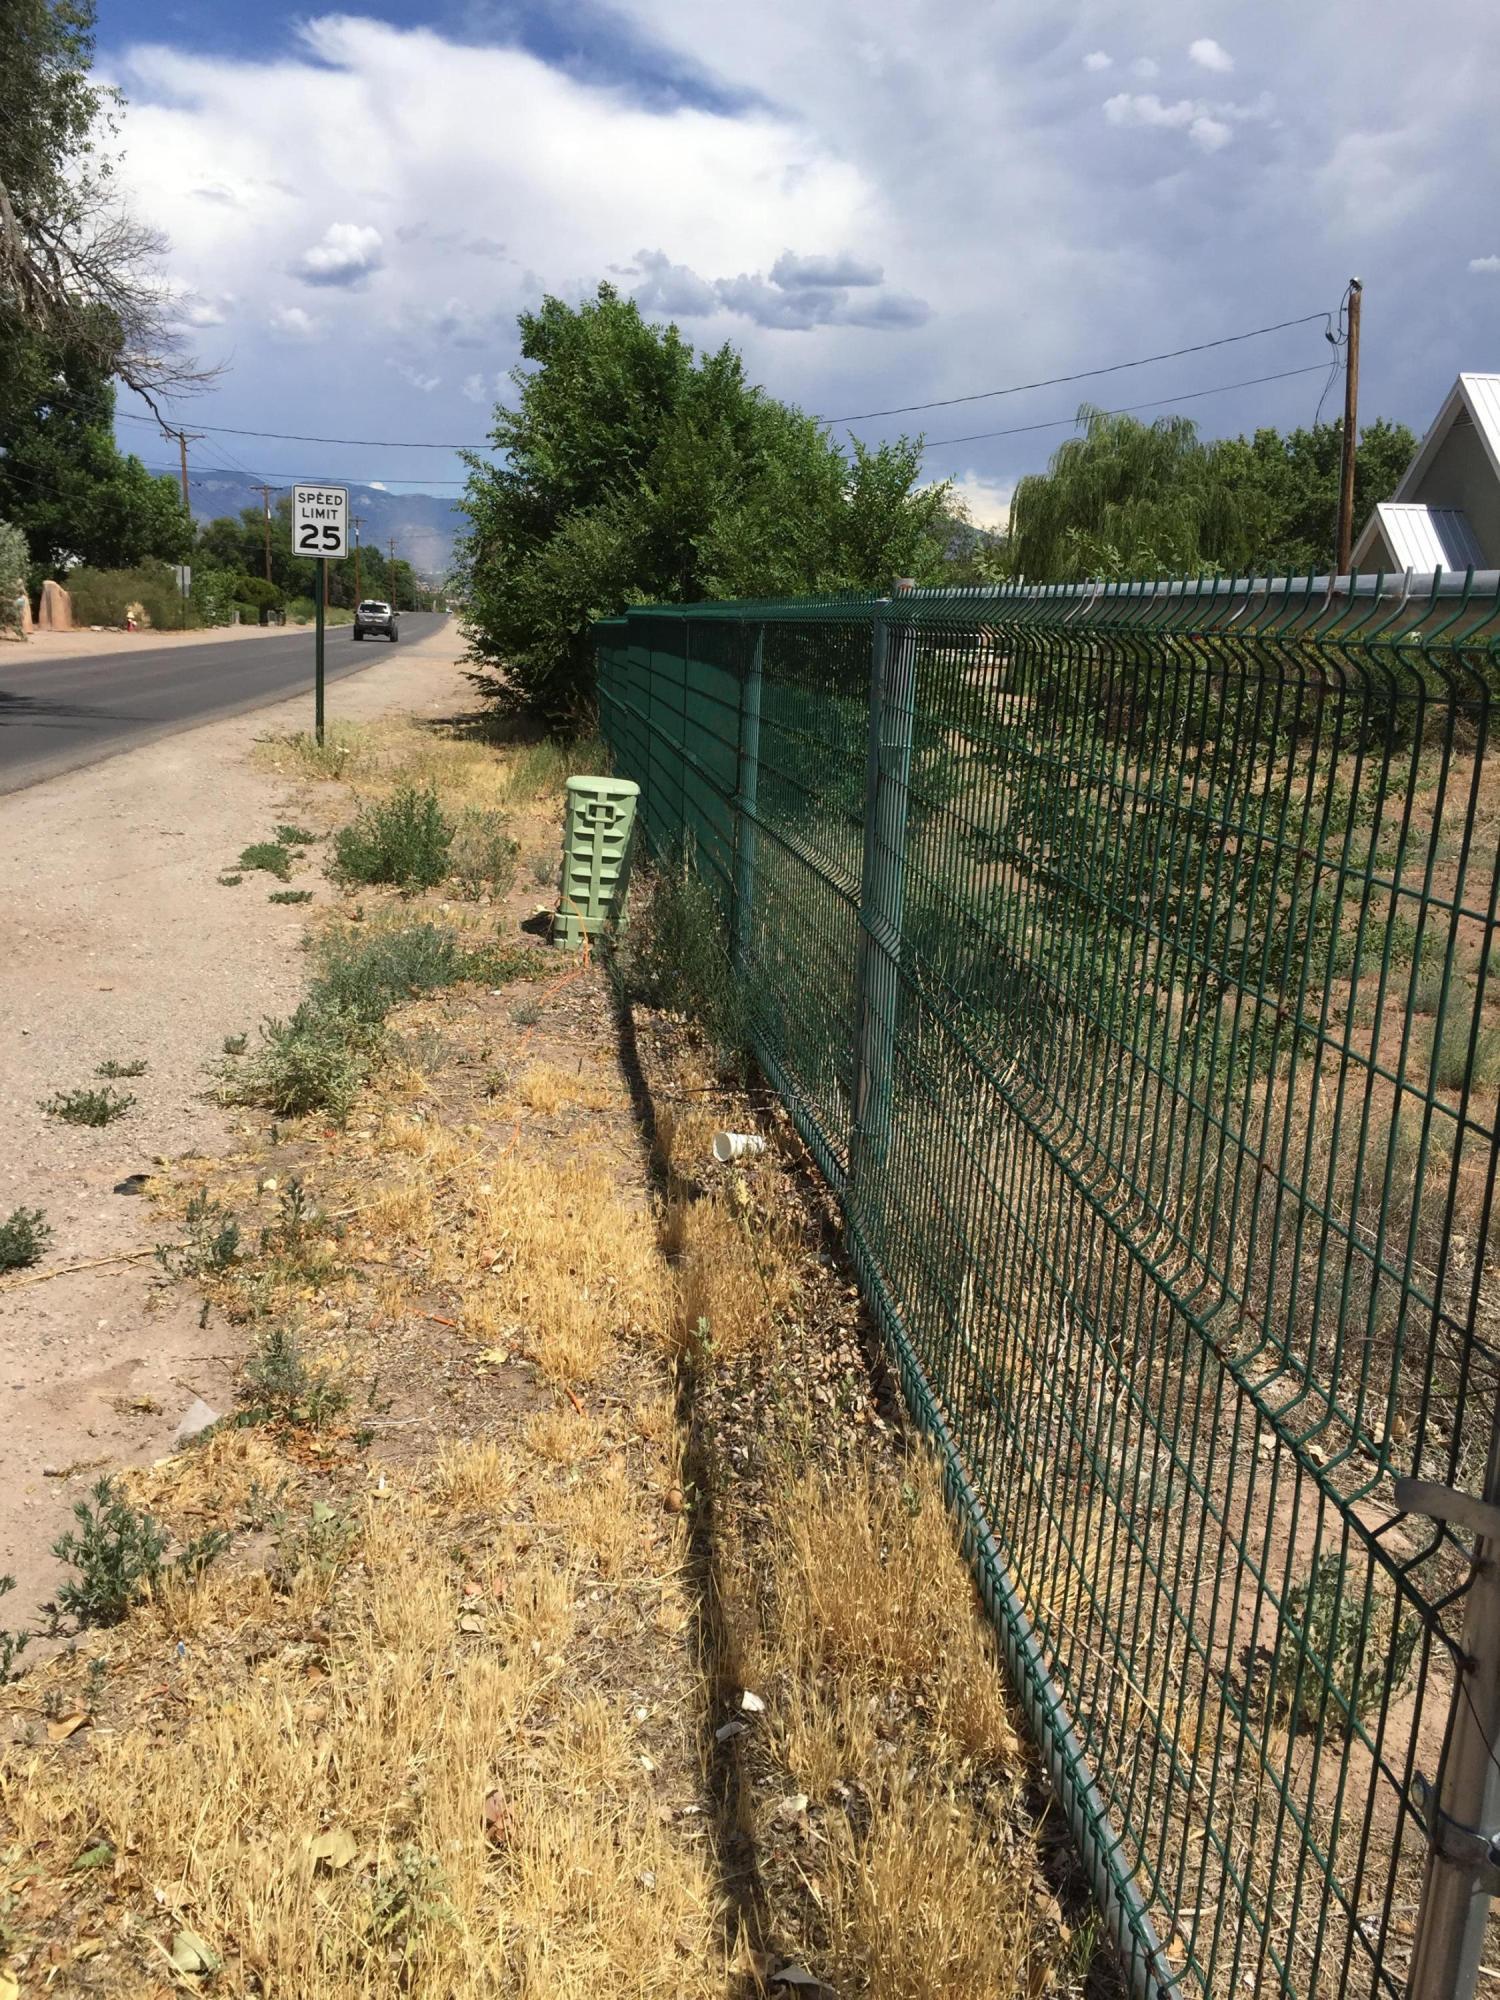 840 El Pueblo Road, one of homes for sale in Northwest Albuquerque and Northwest Heights